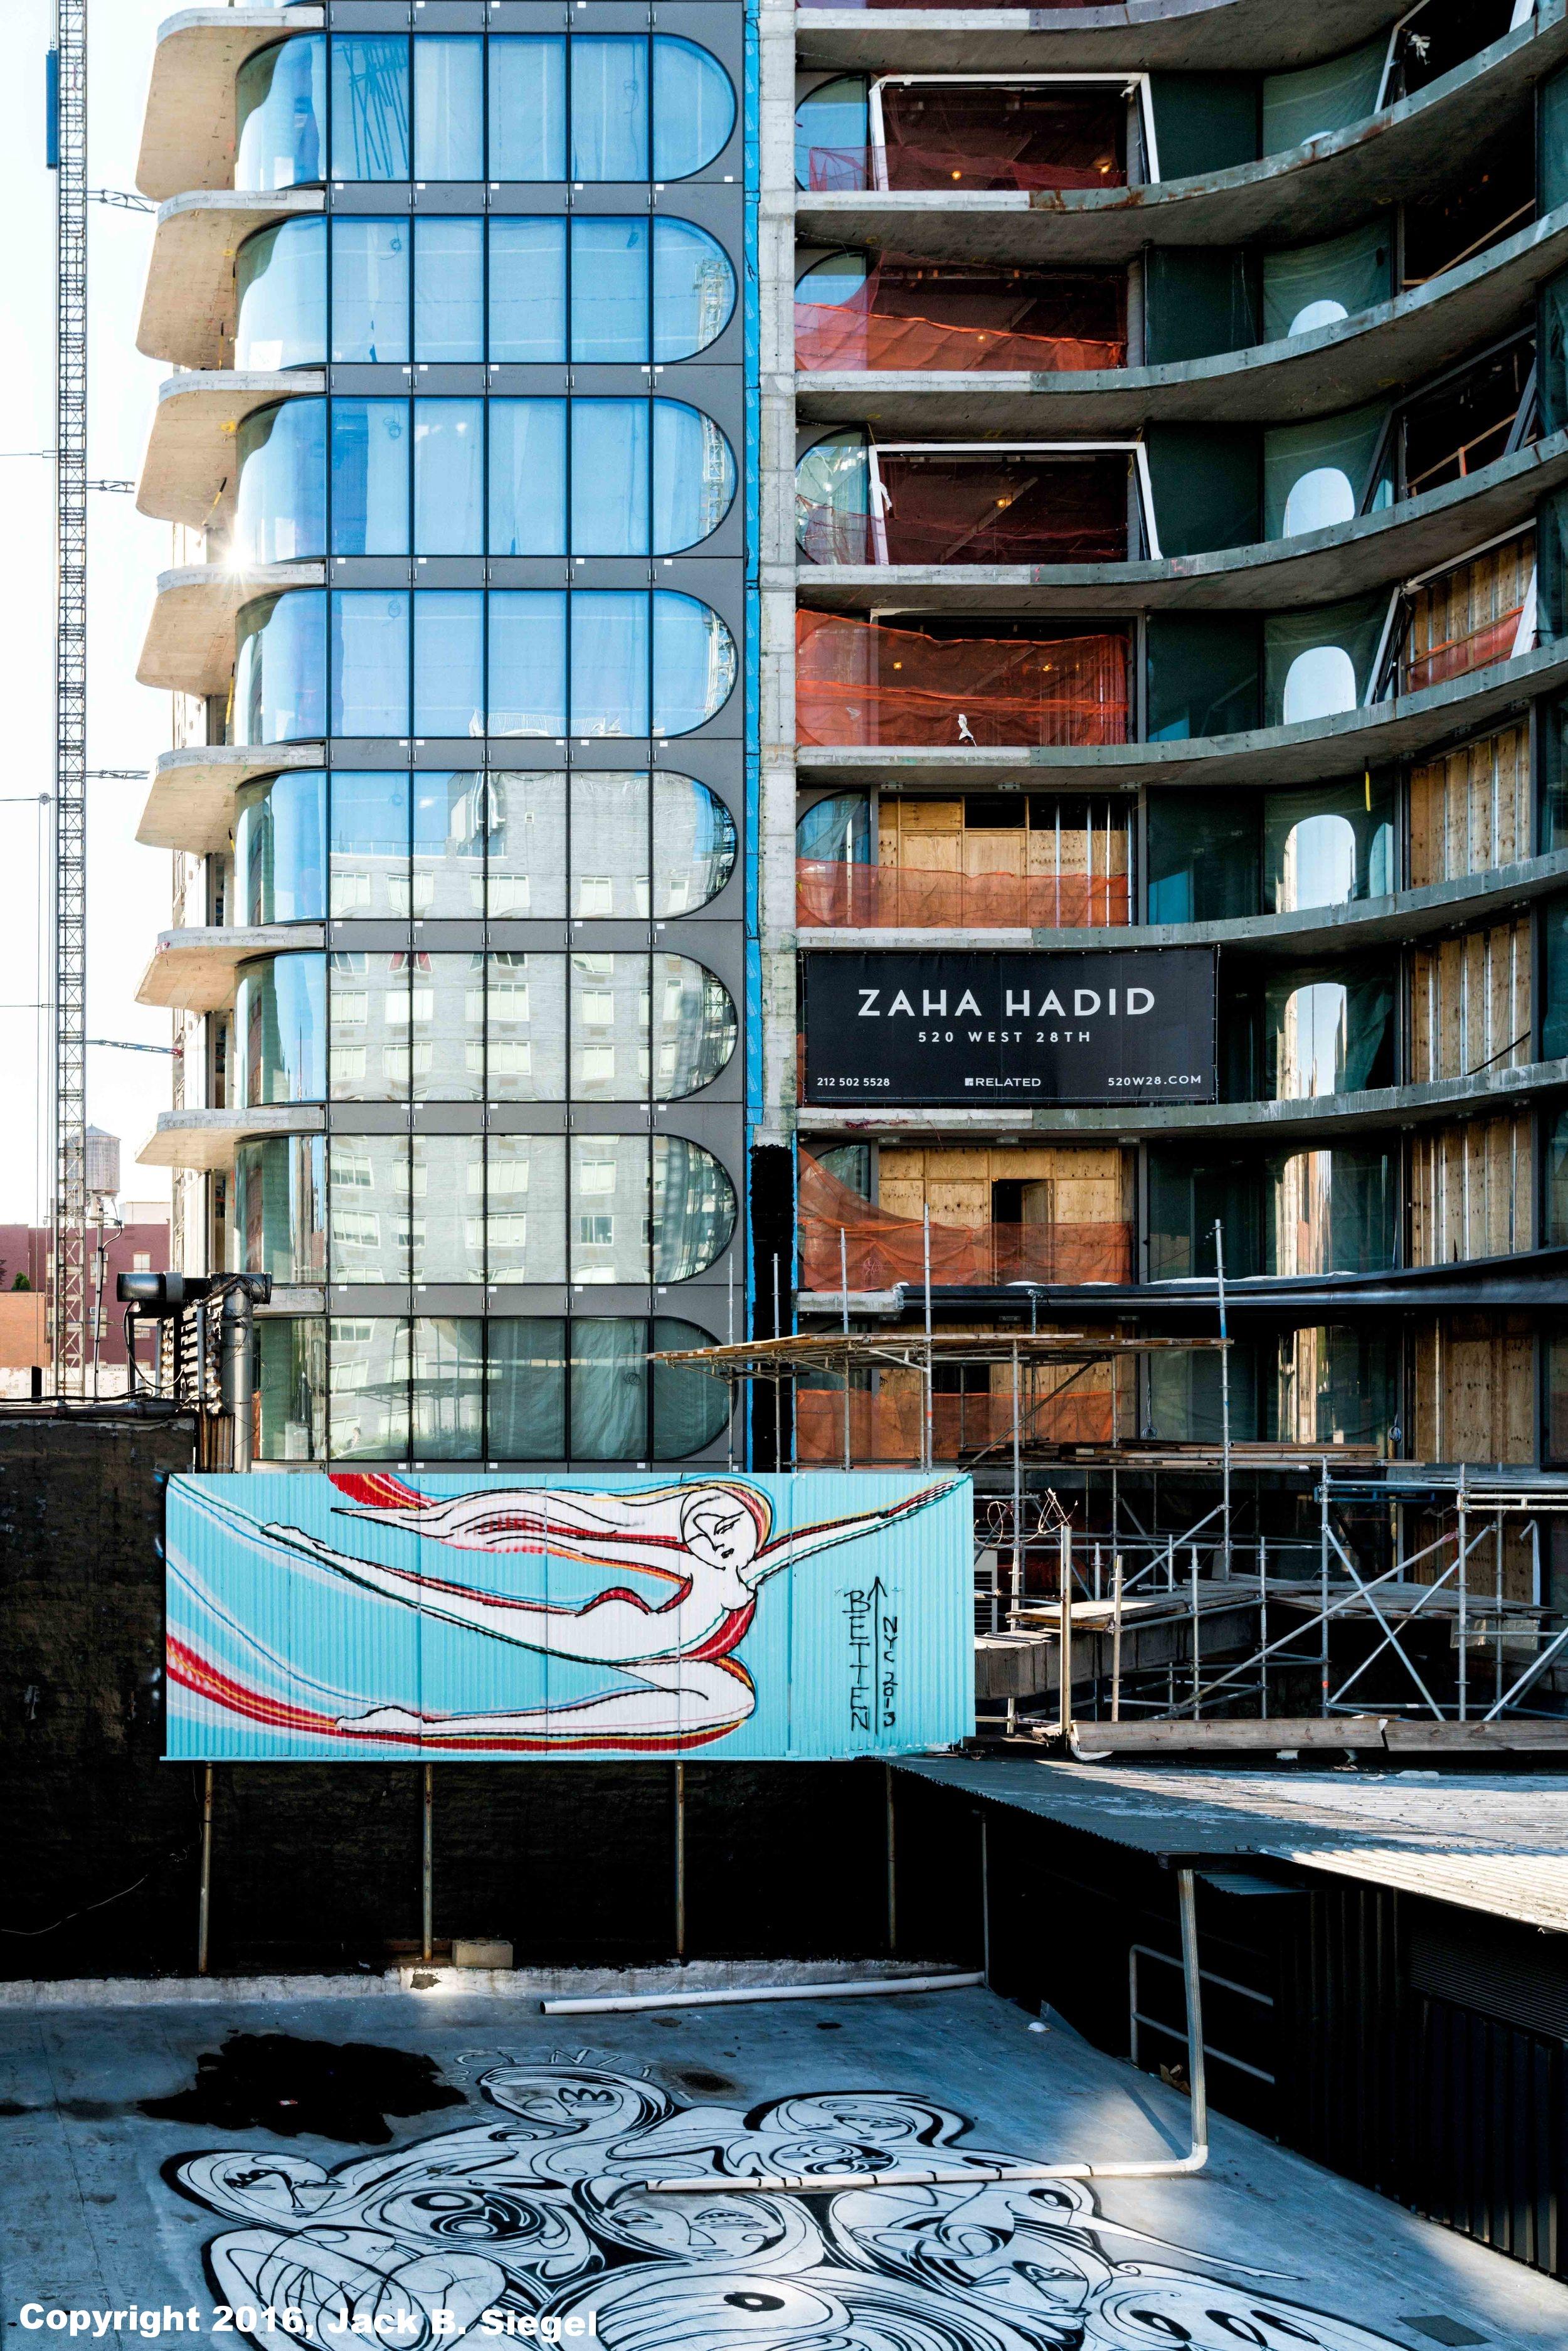 Zaha Hadid's High Line Project